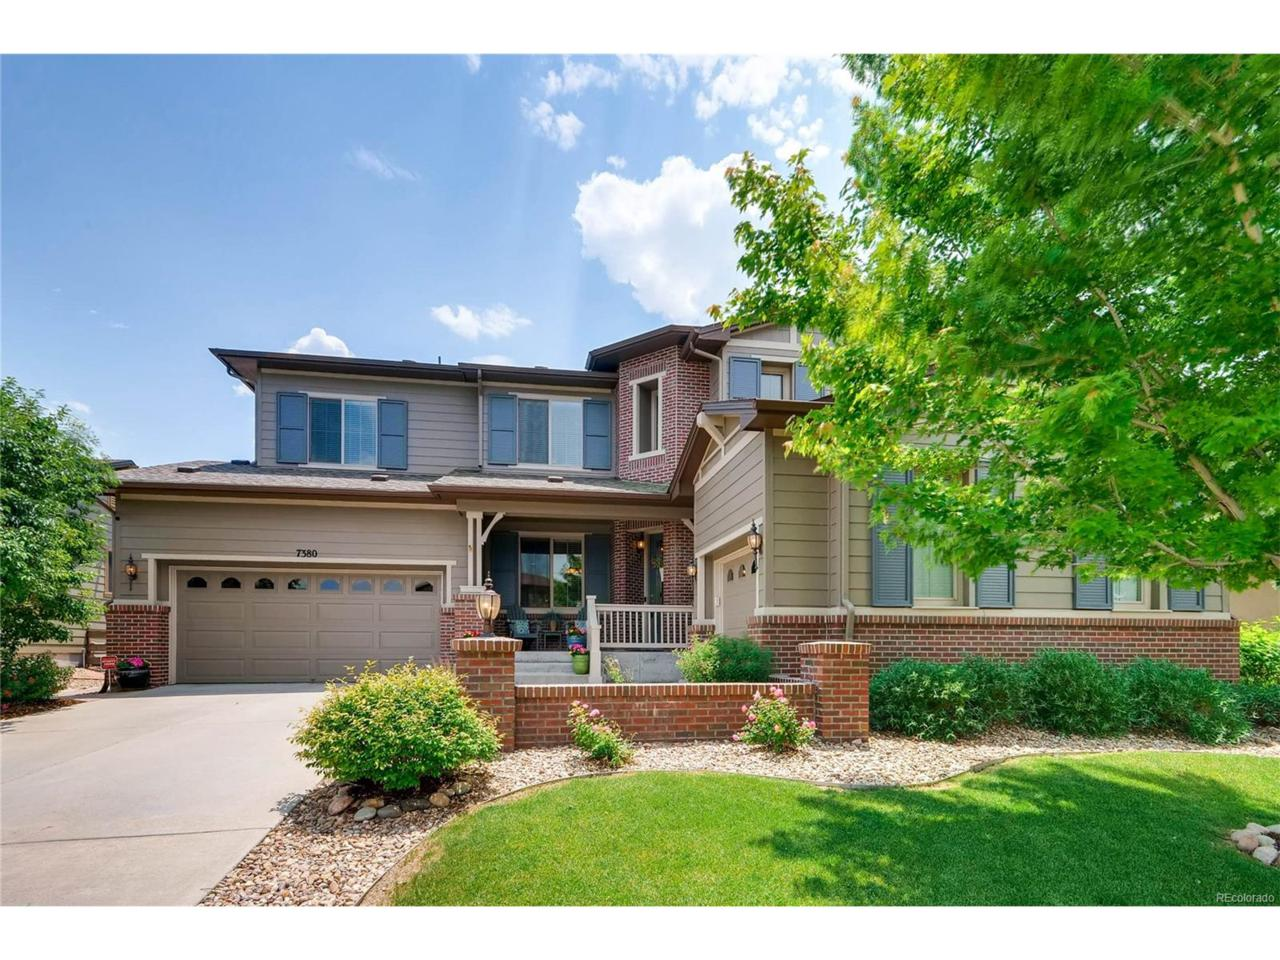 7380 S Jackson Gap Way, Aurora, CO 80016 (MLS #8837725) :: 8z Real Estate